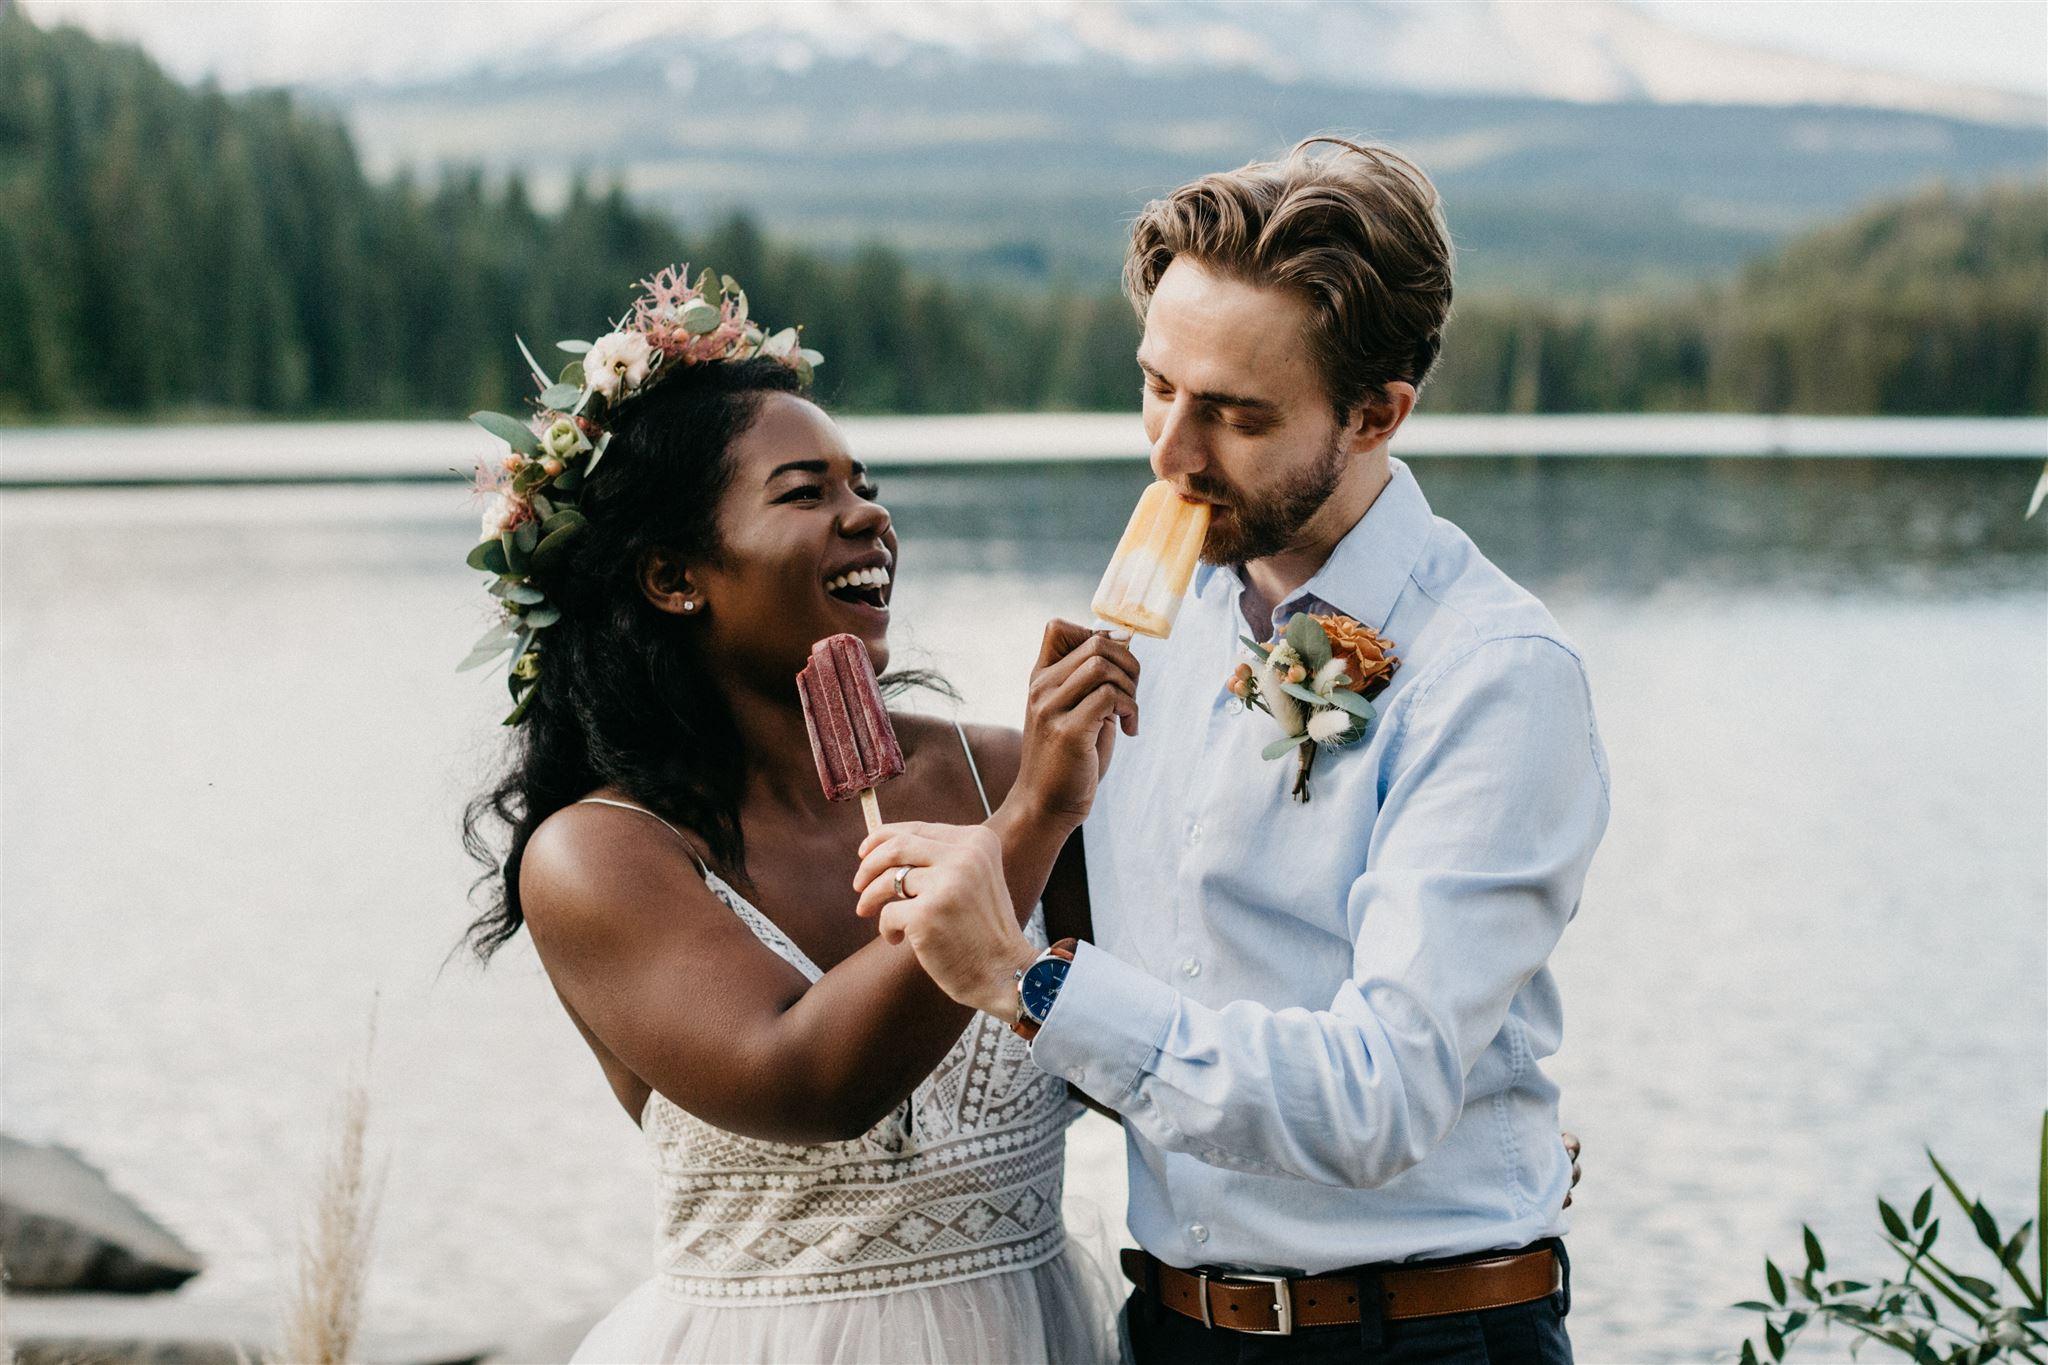 sloshy pops, popsicles, wedding popsicle, wedding desserts, summer wedding